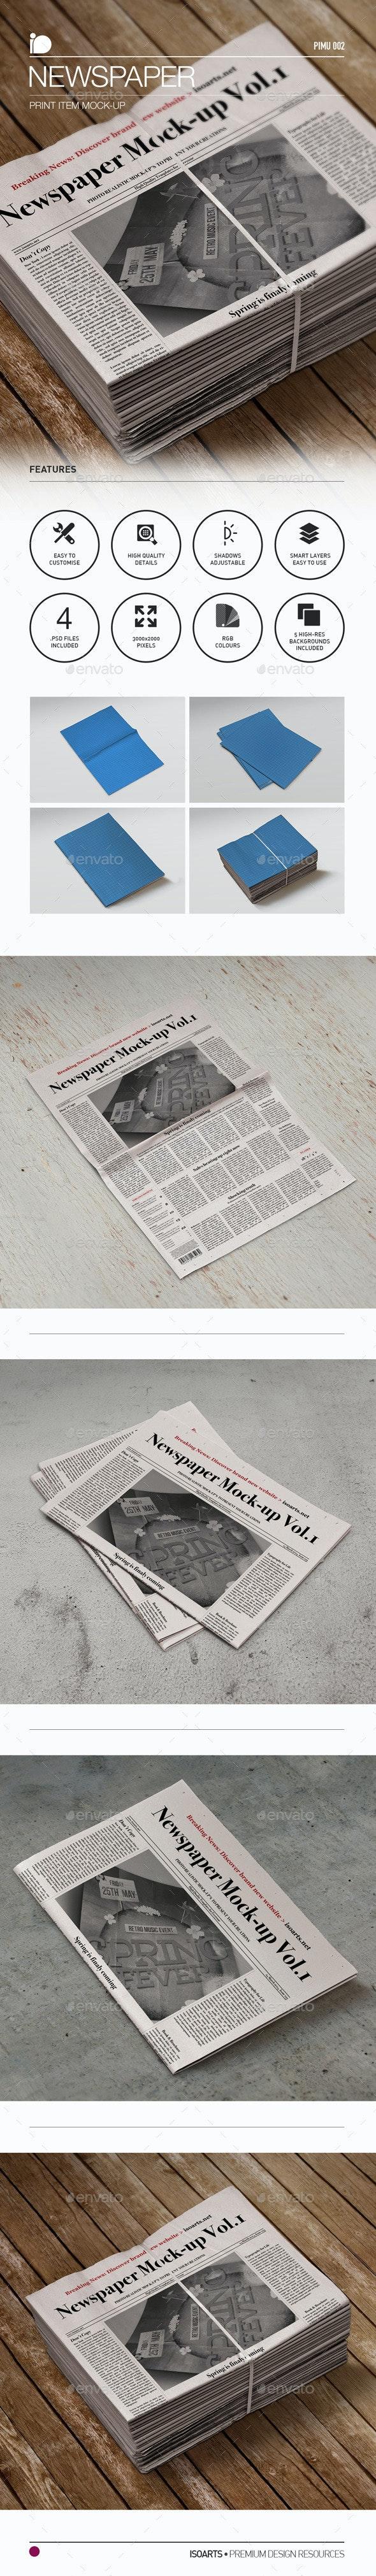 Mock-Up • Newspaper - Print Product Mock-Ups